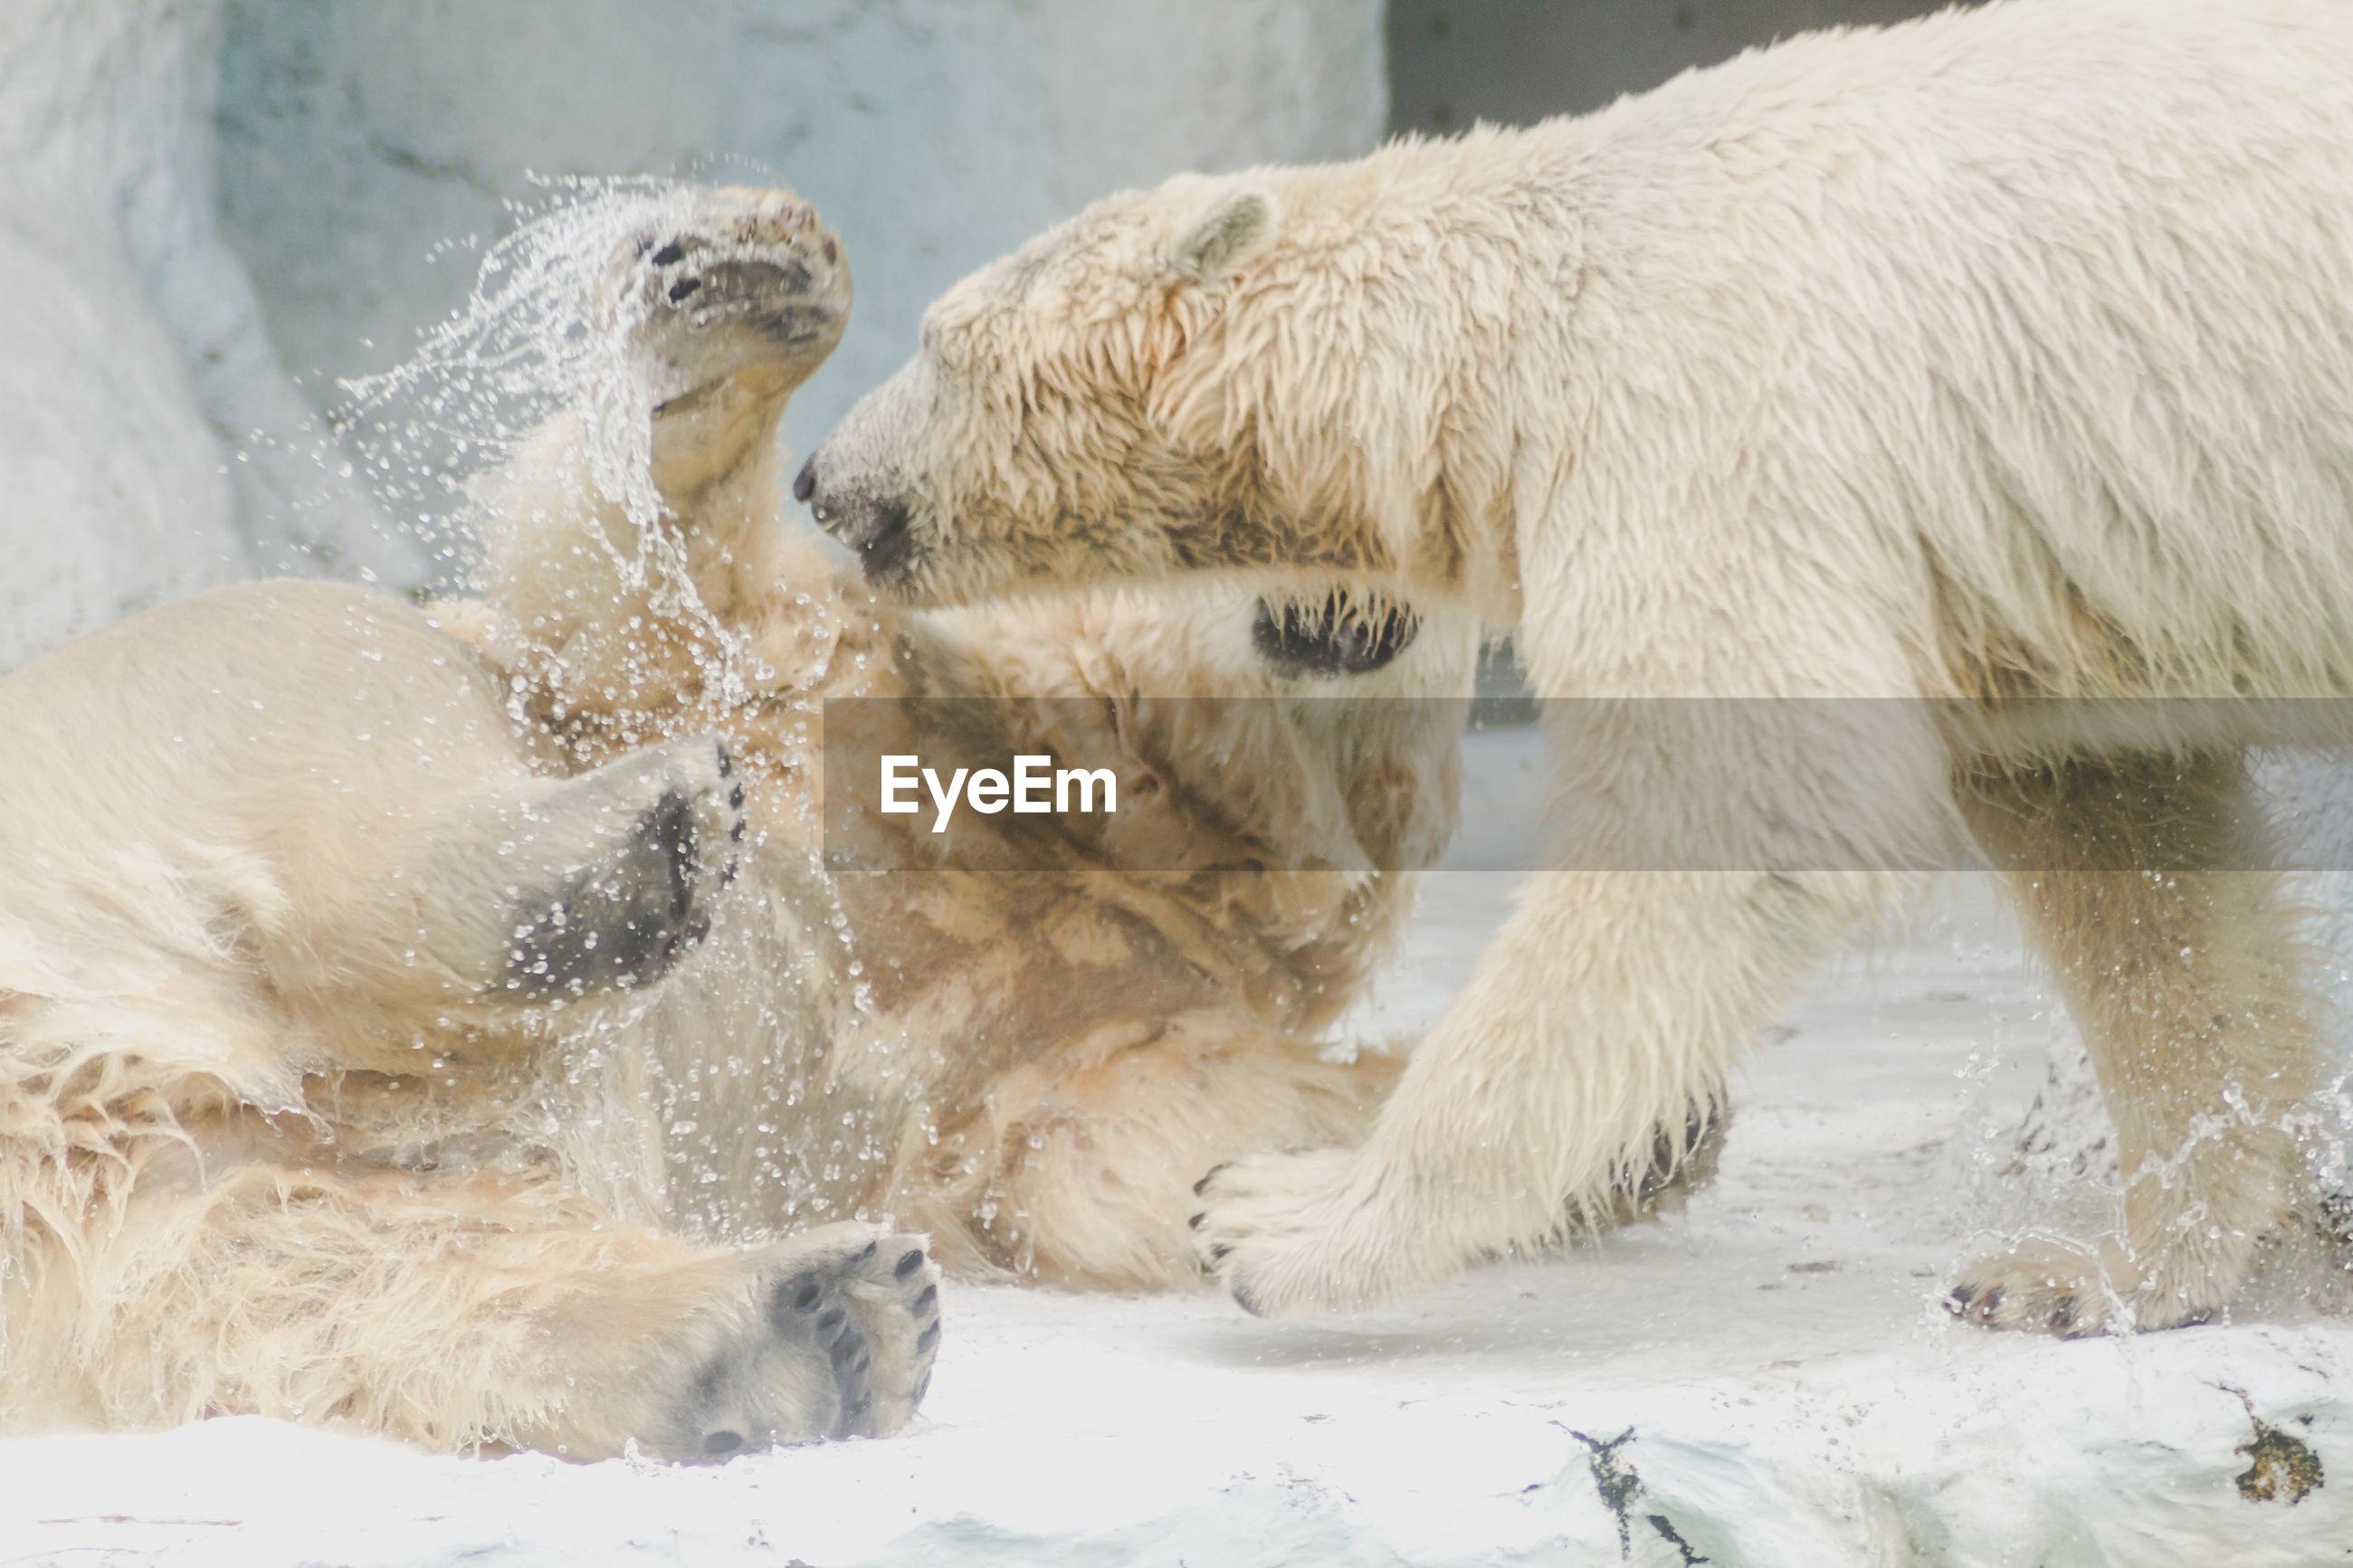 Bears fighting in water